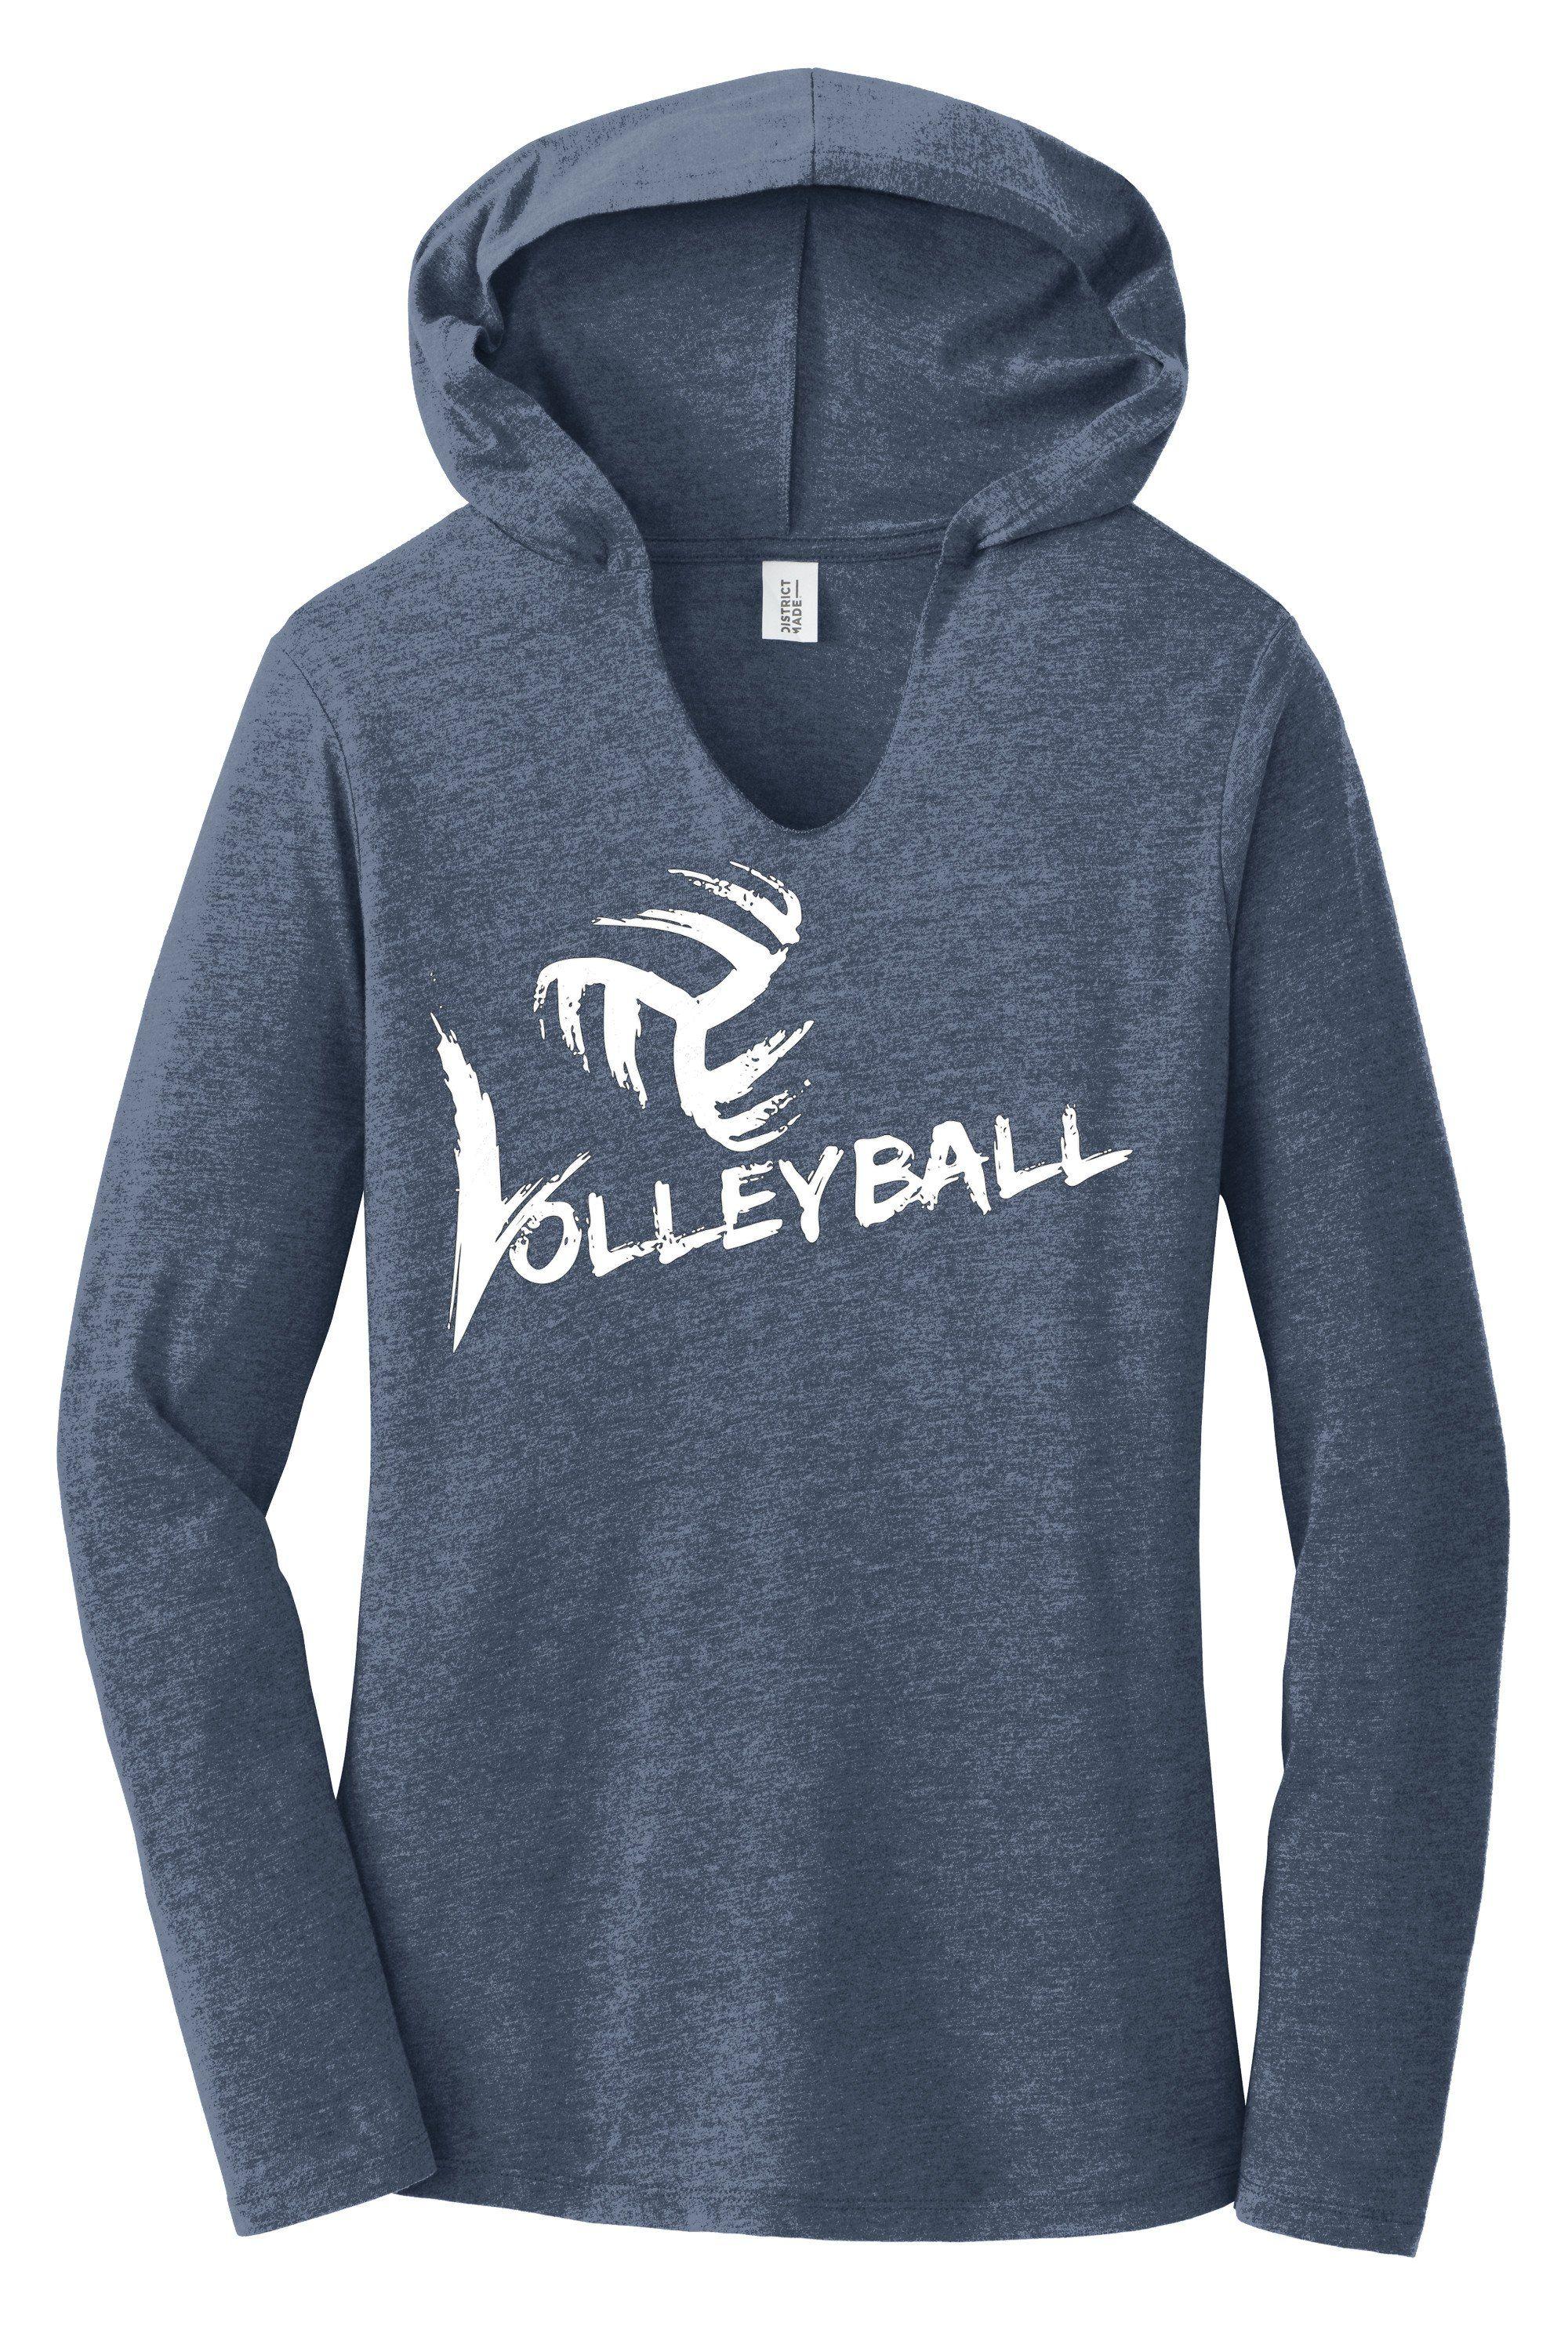 Volleyball Long Sleeve Hooded T Shirt Hoodie Shirt Graphic Hoodies Hoodies Womens